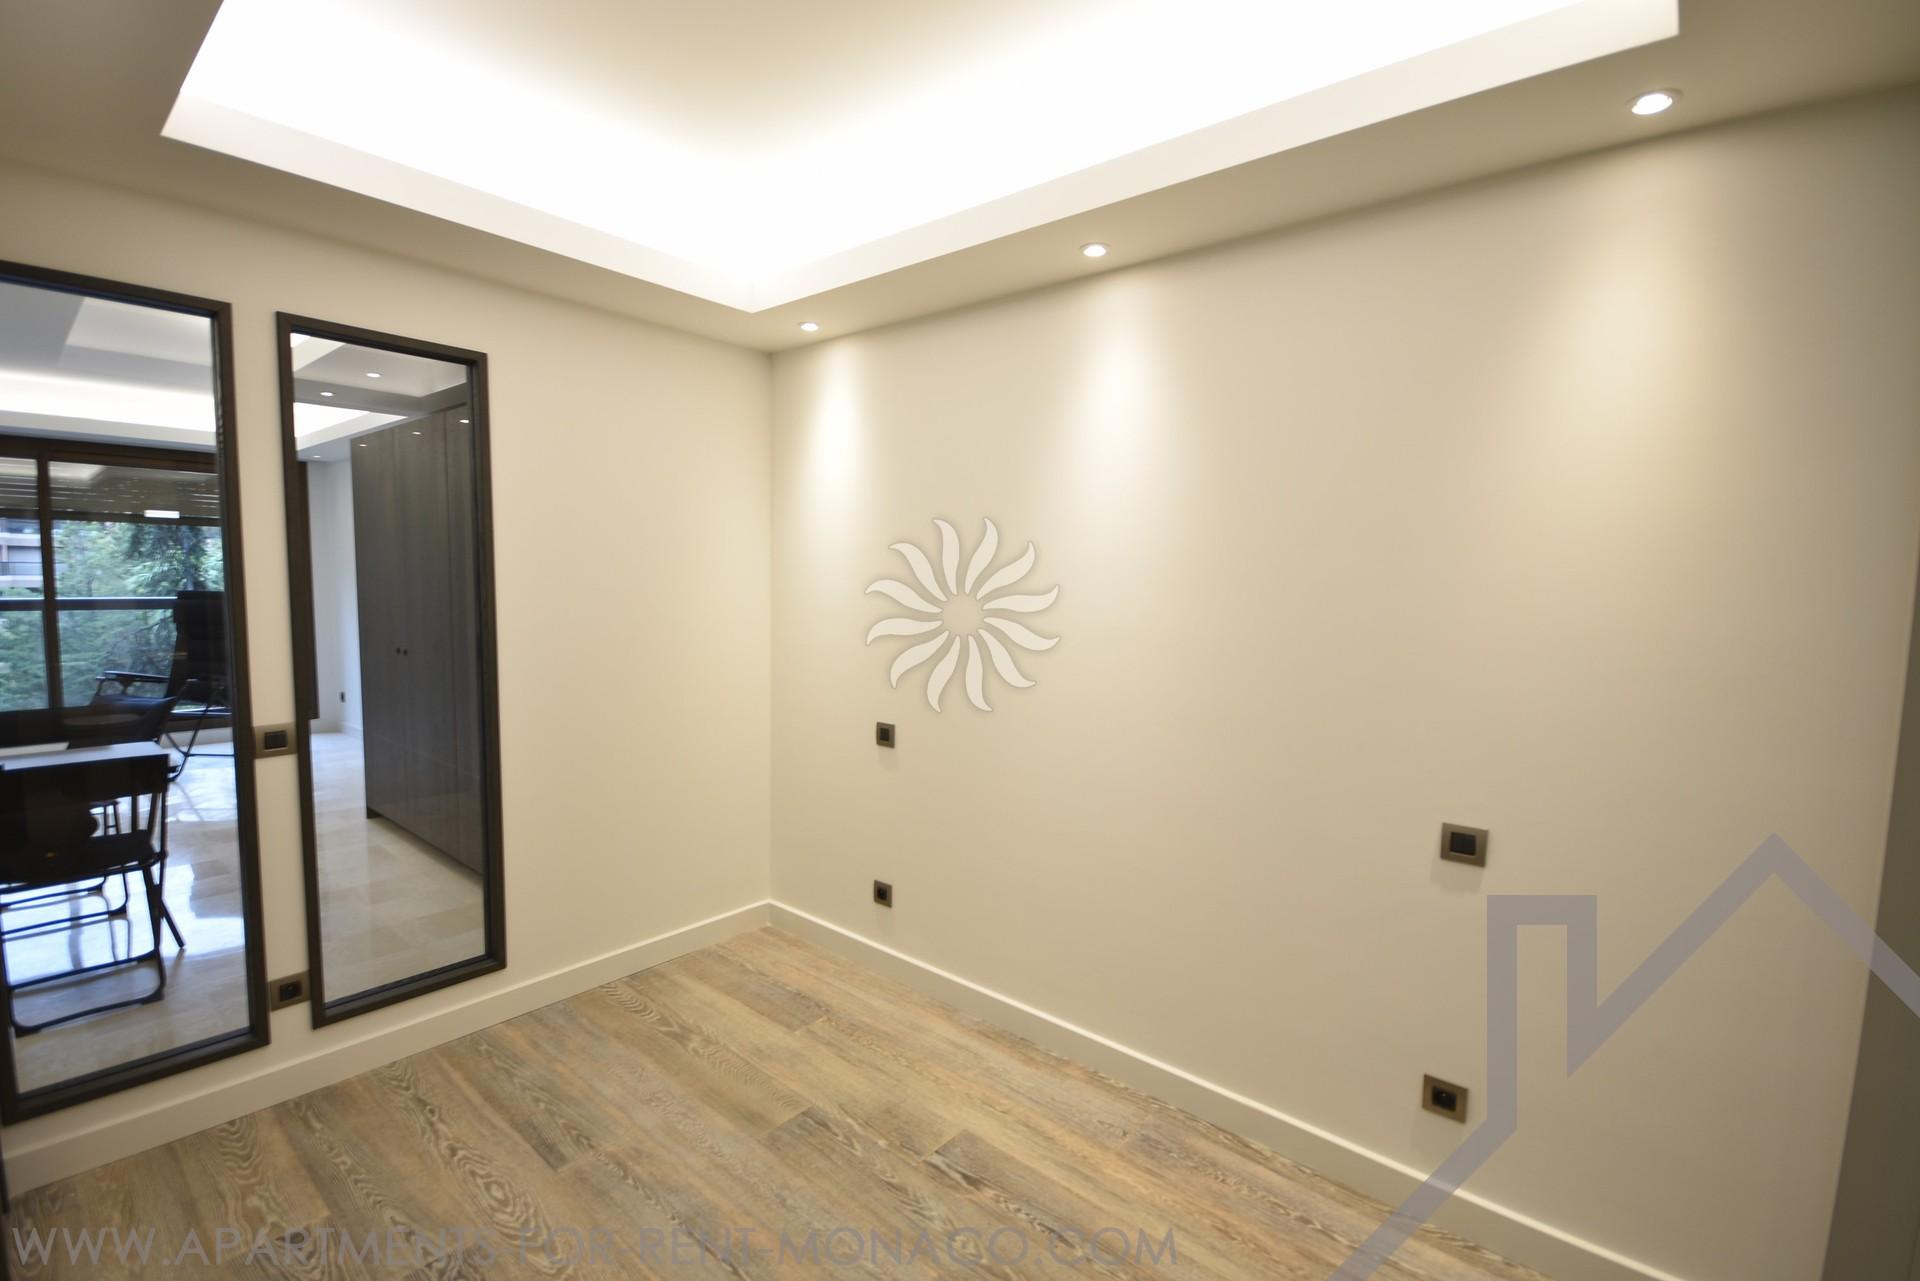 monte carlo sun new modern apartment apartments for rent in monaco